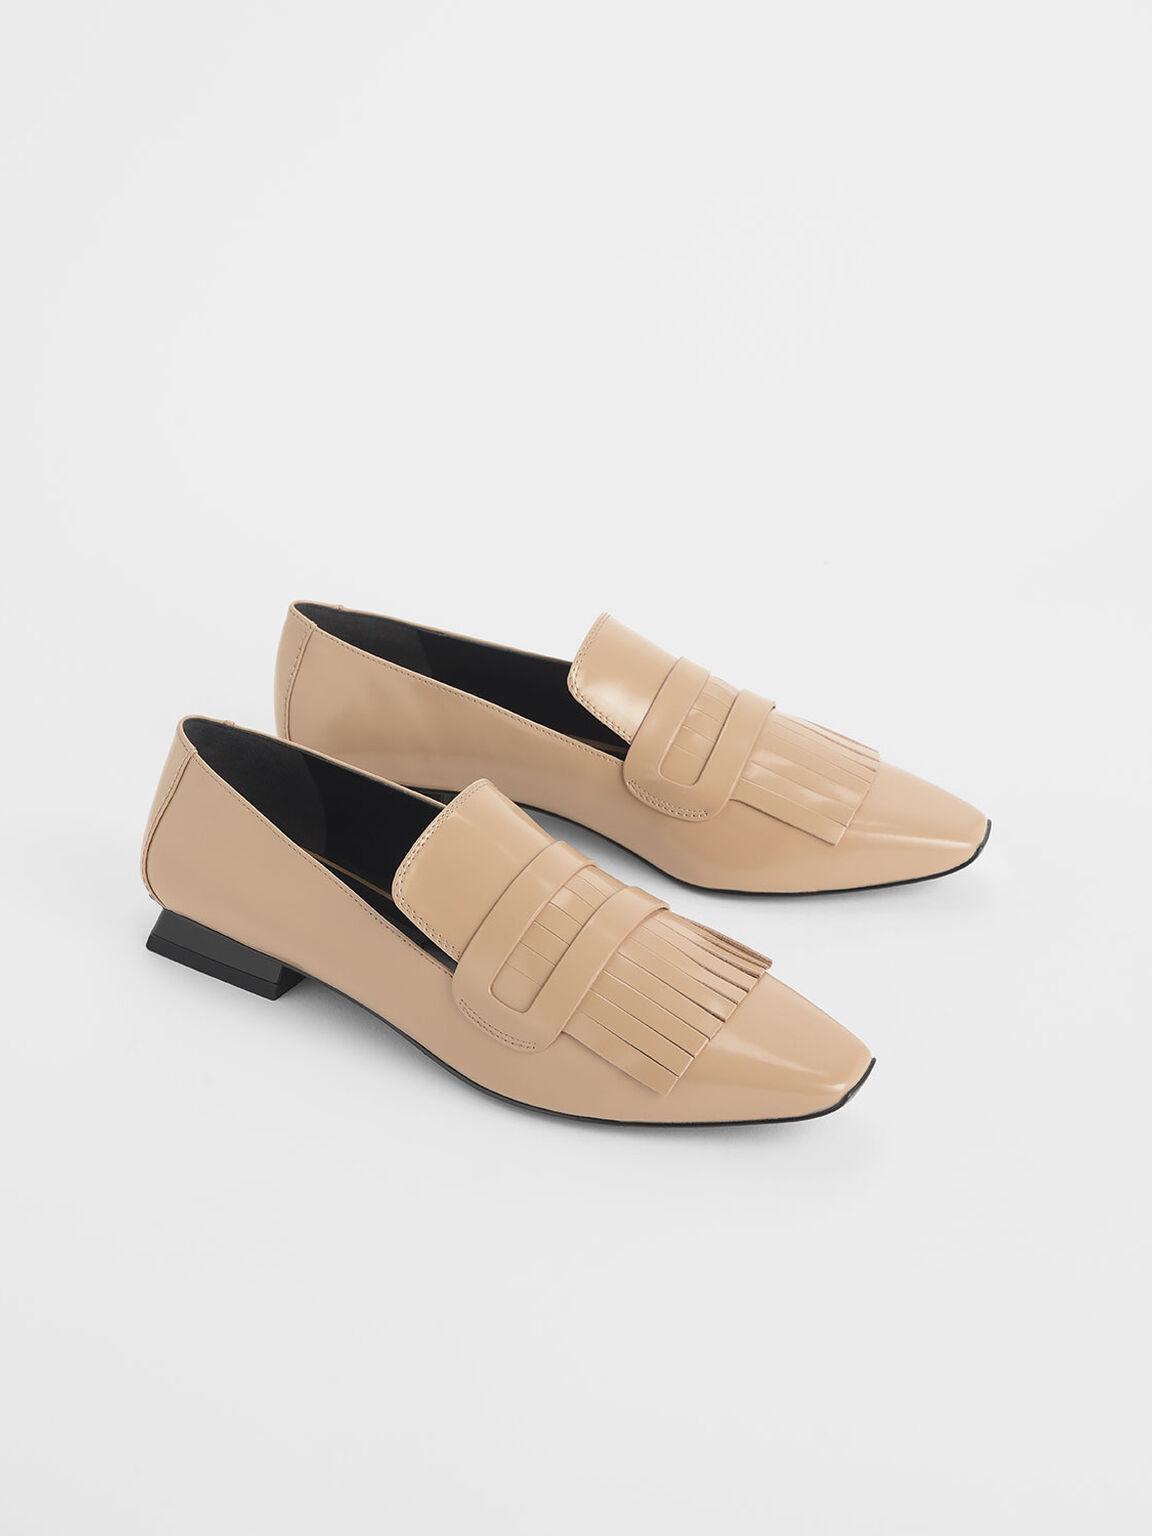 Fringed Leather Loafers, Beige, hi-res